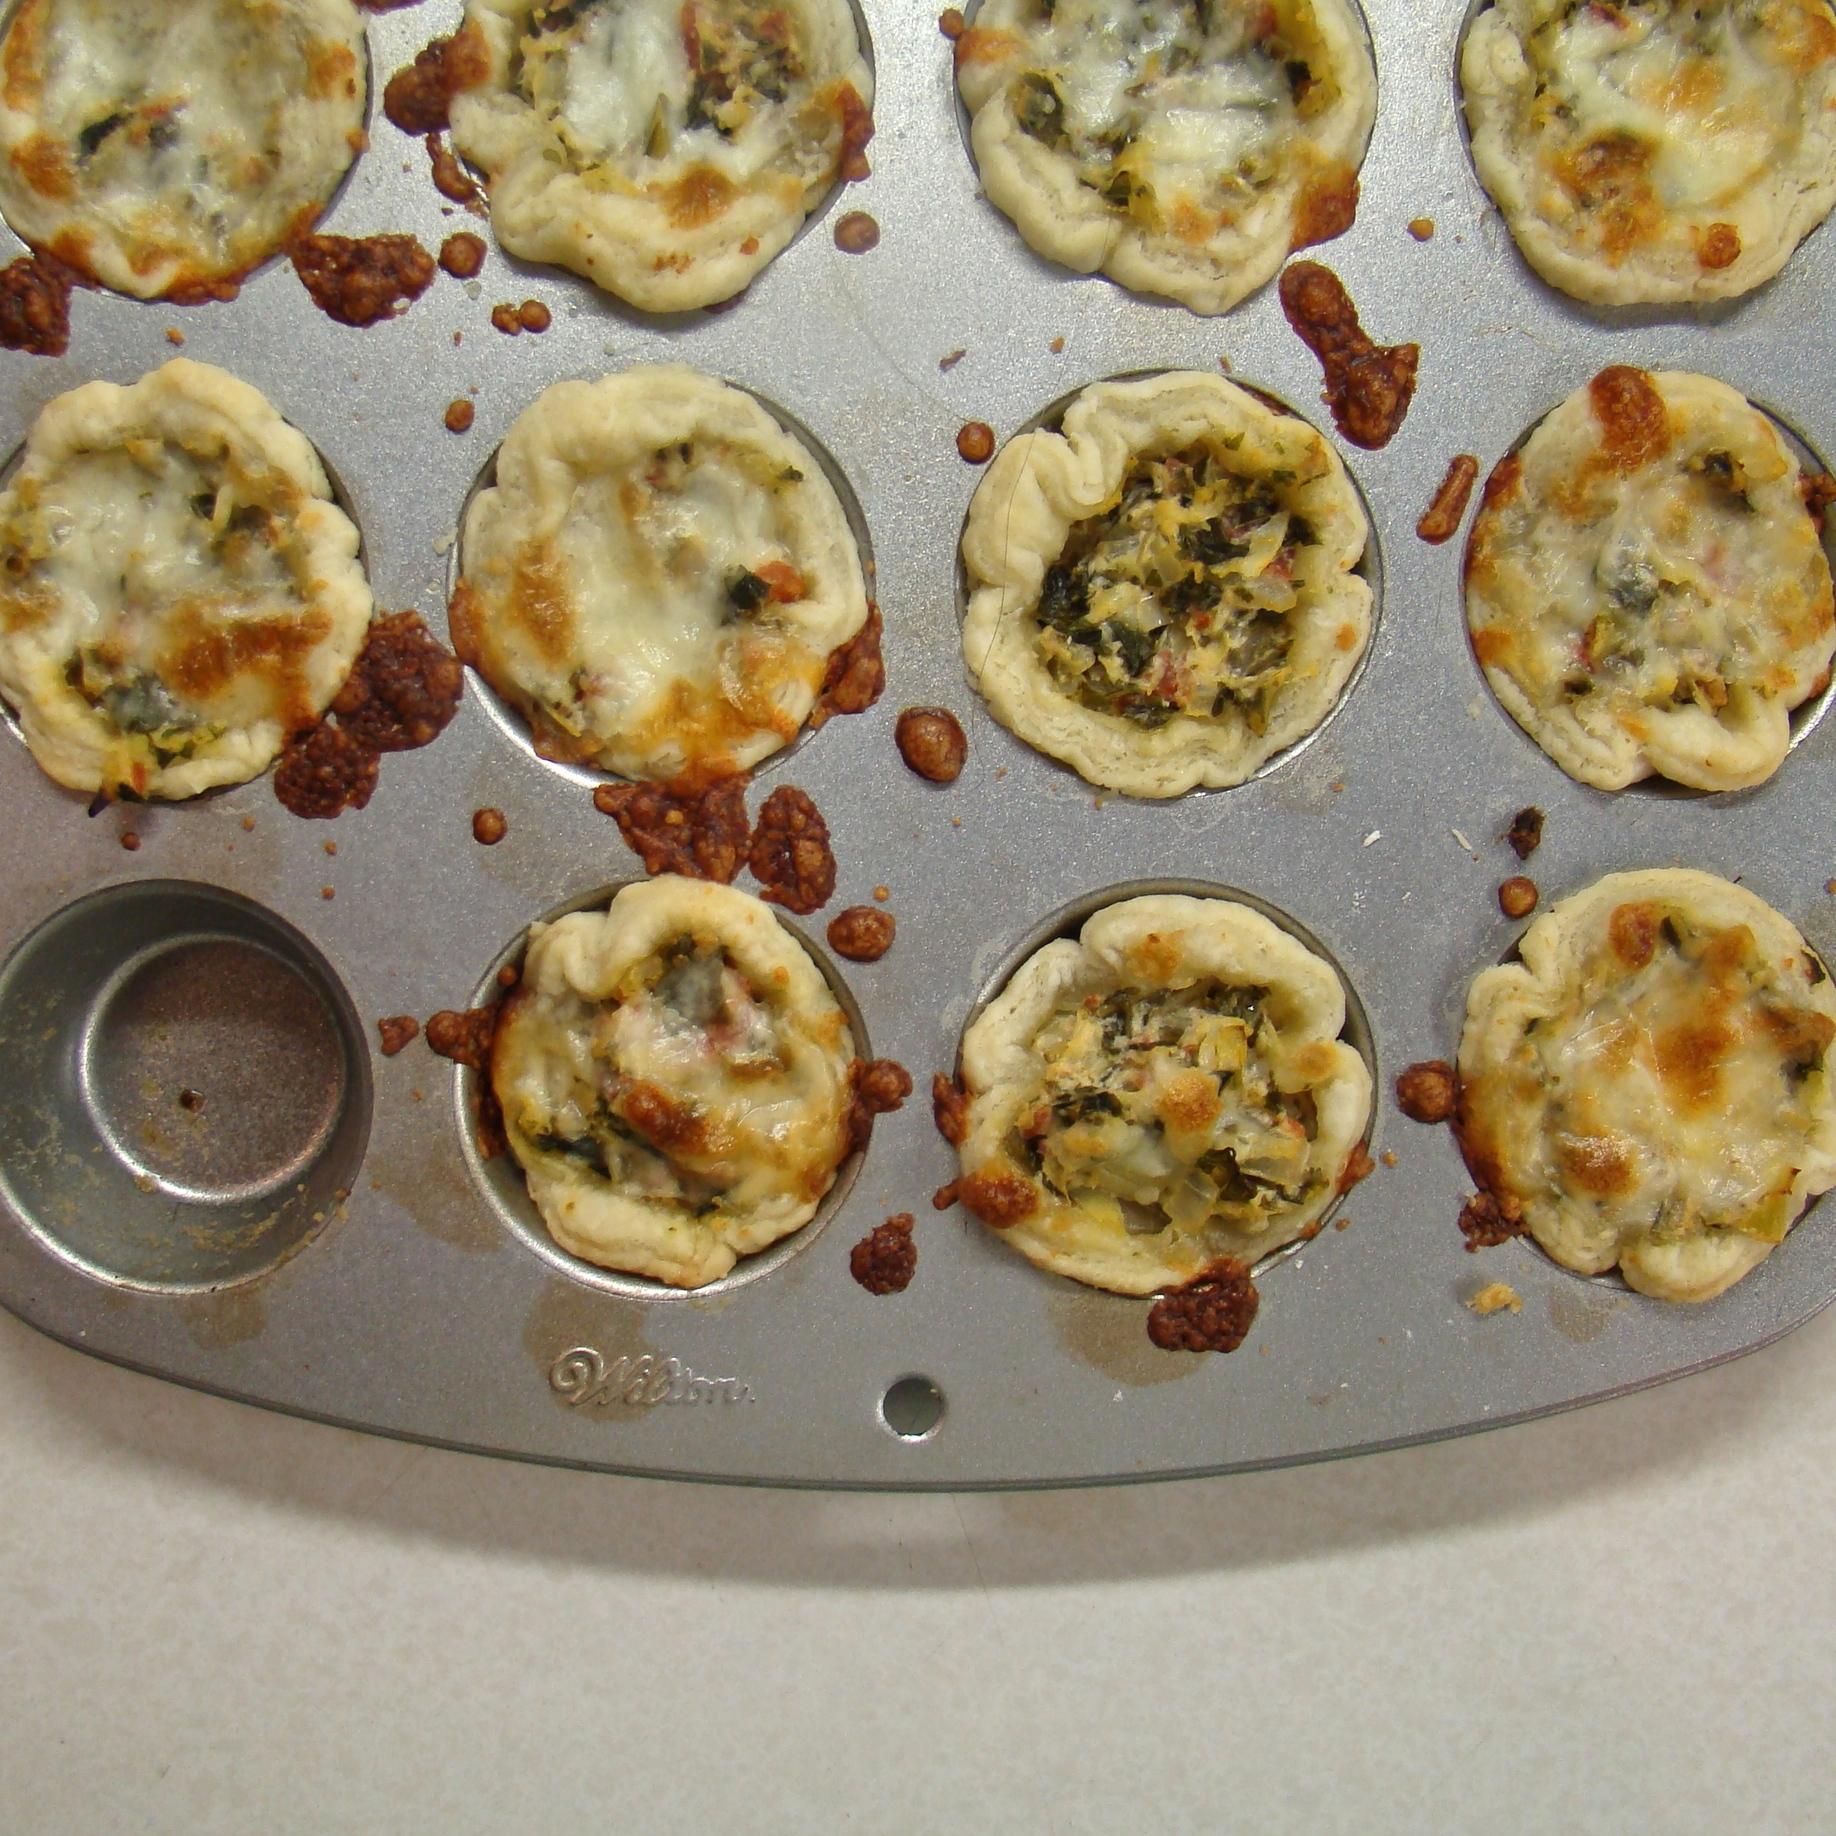 Caramelized Onion, Kale, and Artichoke Tartlets